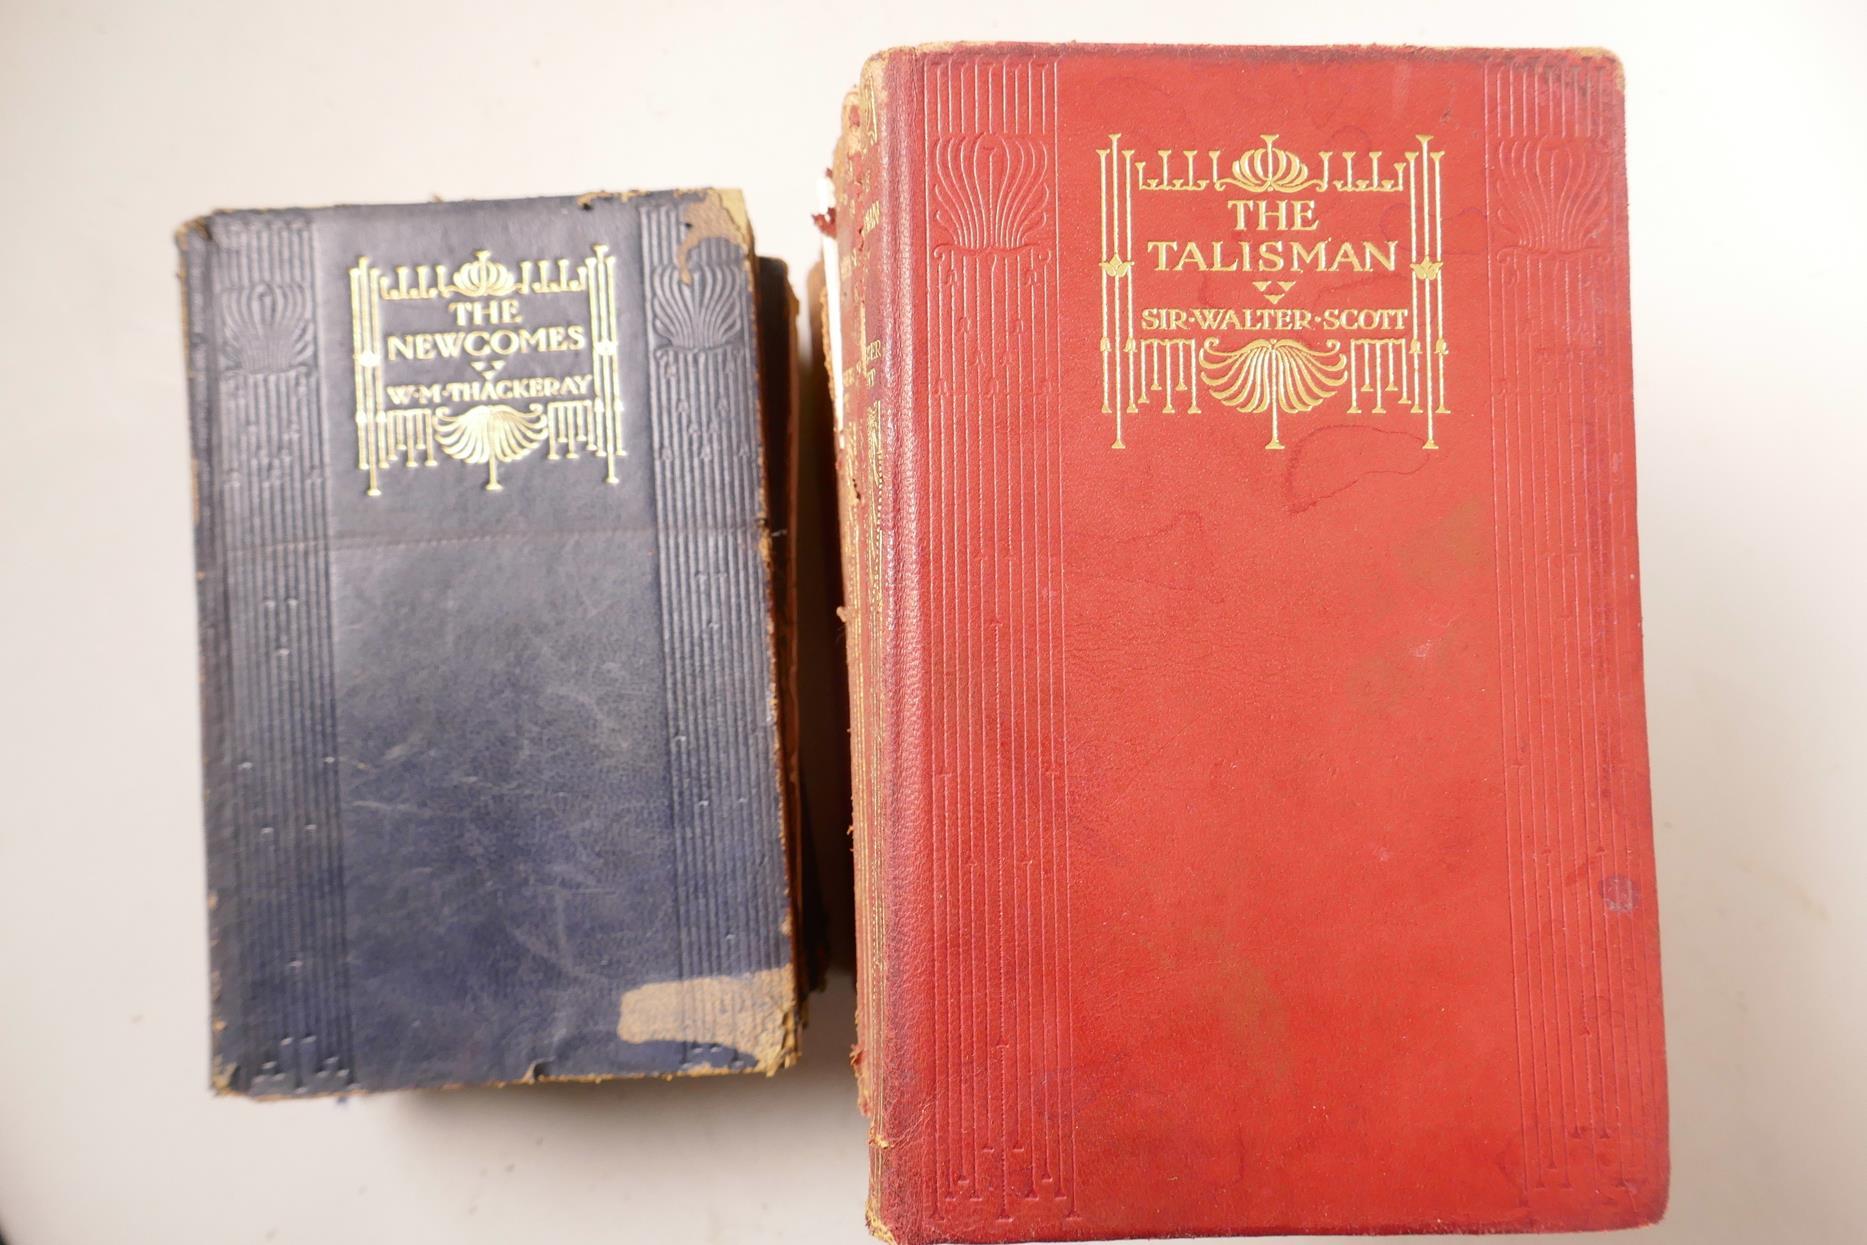 Lot 59 - Sir Walter Scott, 'The Talisman', Macmilan's illustrated pocket Scott on India paper, published by